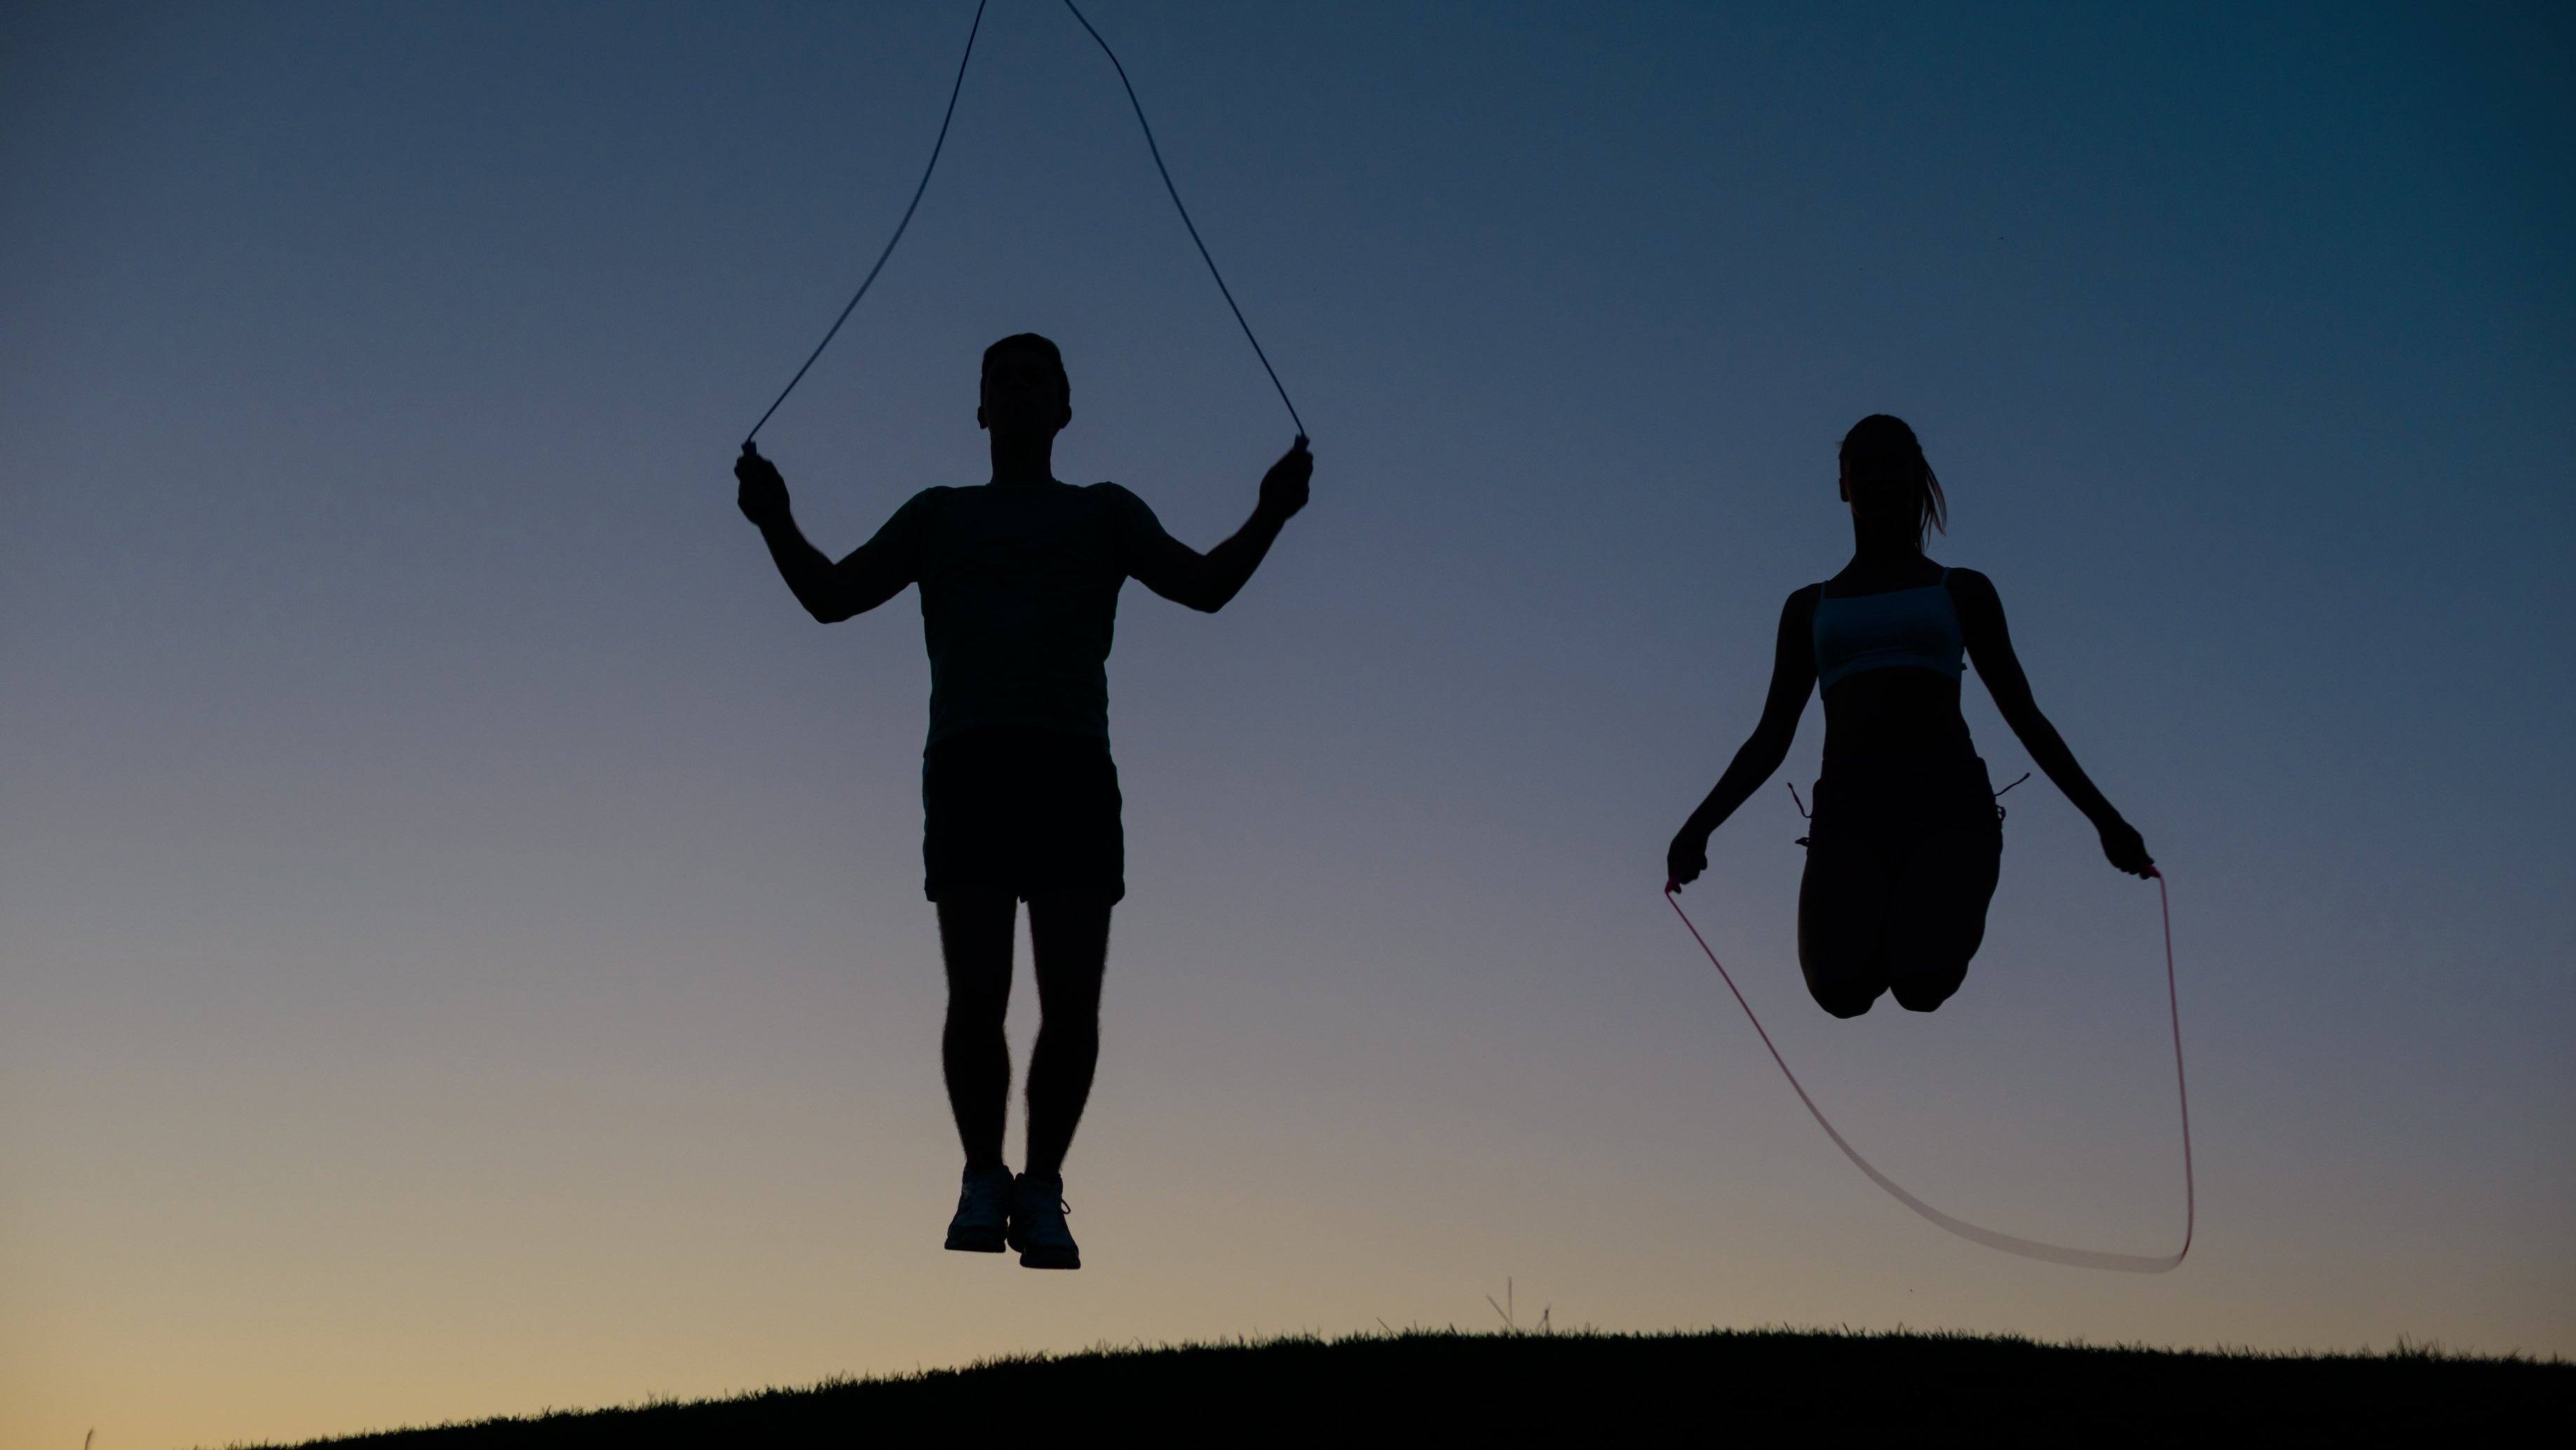 Sjipning kan være motion, benhård træning, fri leg eller opvisning med tricks.